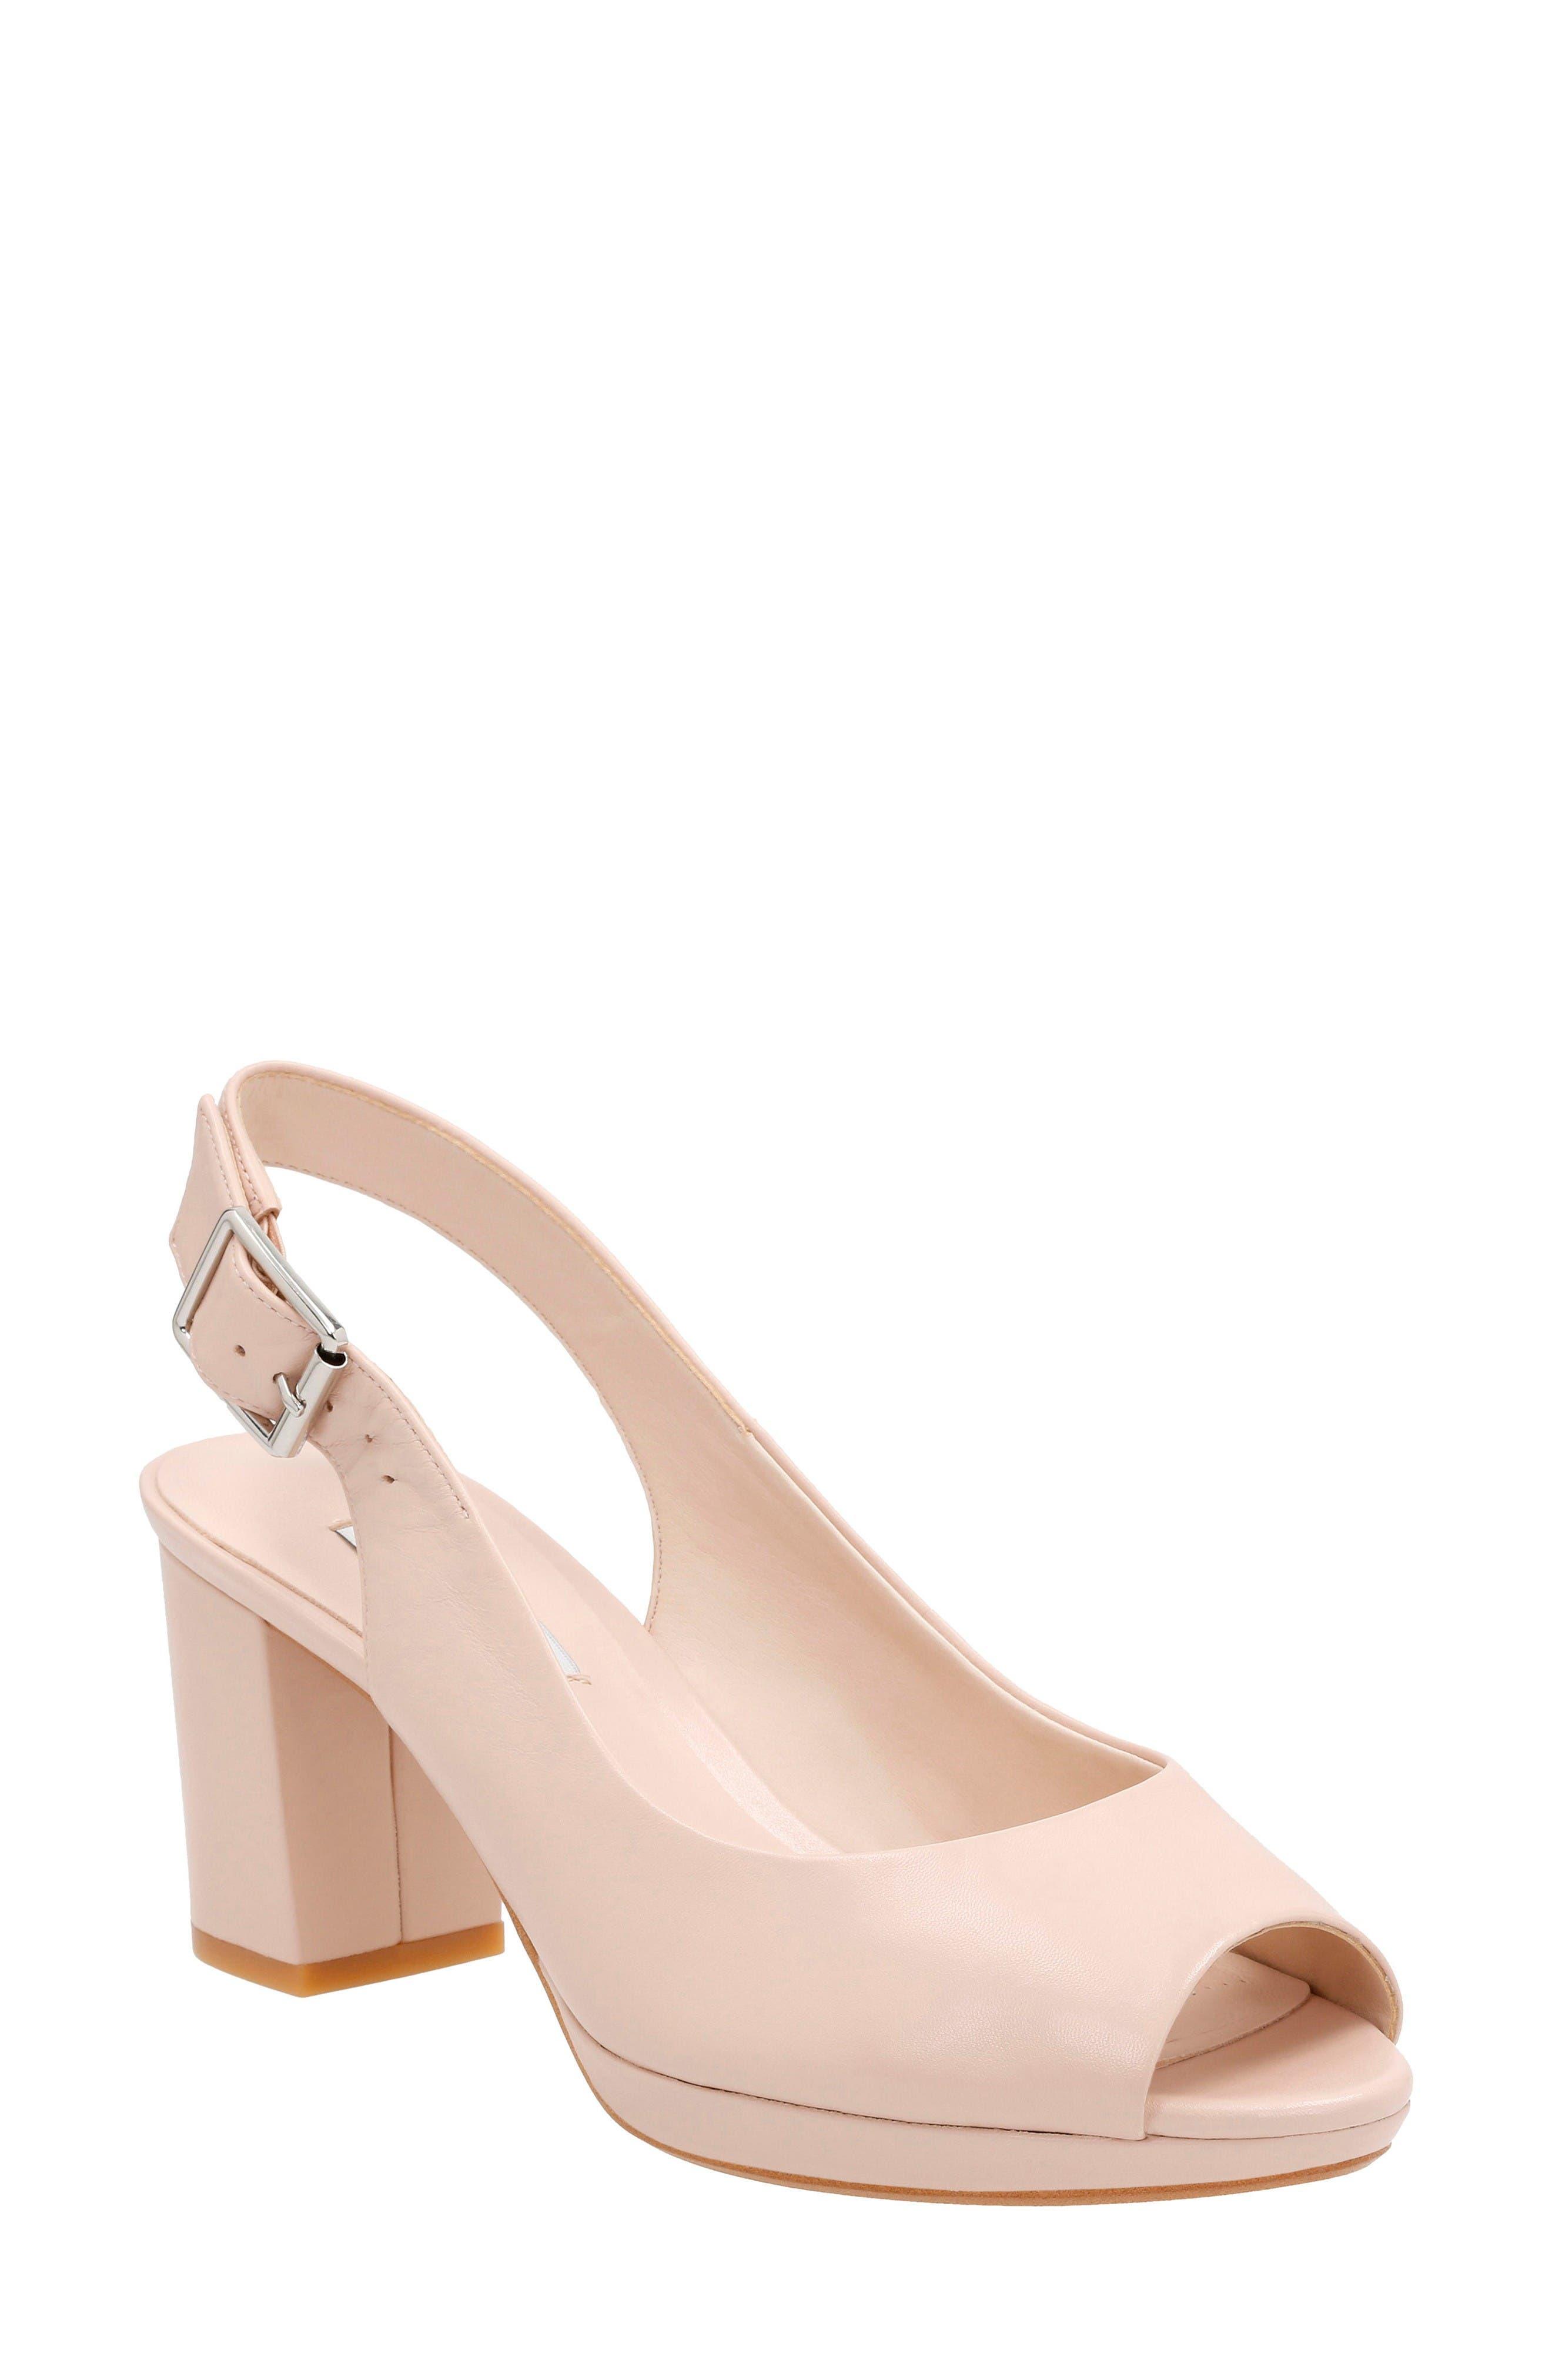 CLARKS<SUP>®</SUP> Kelda Slingback Sandal